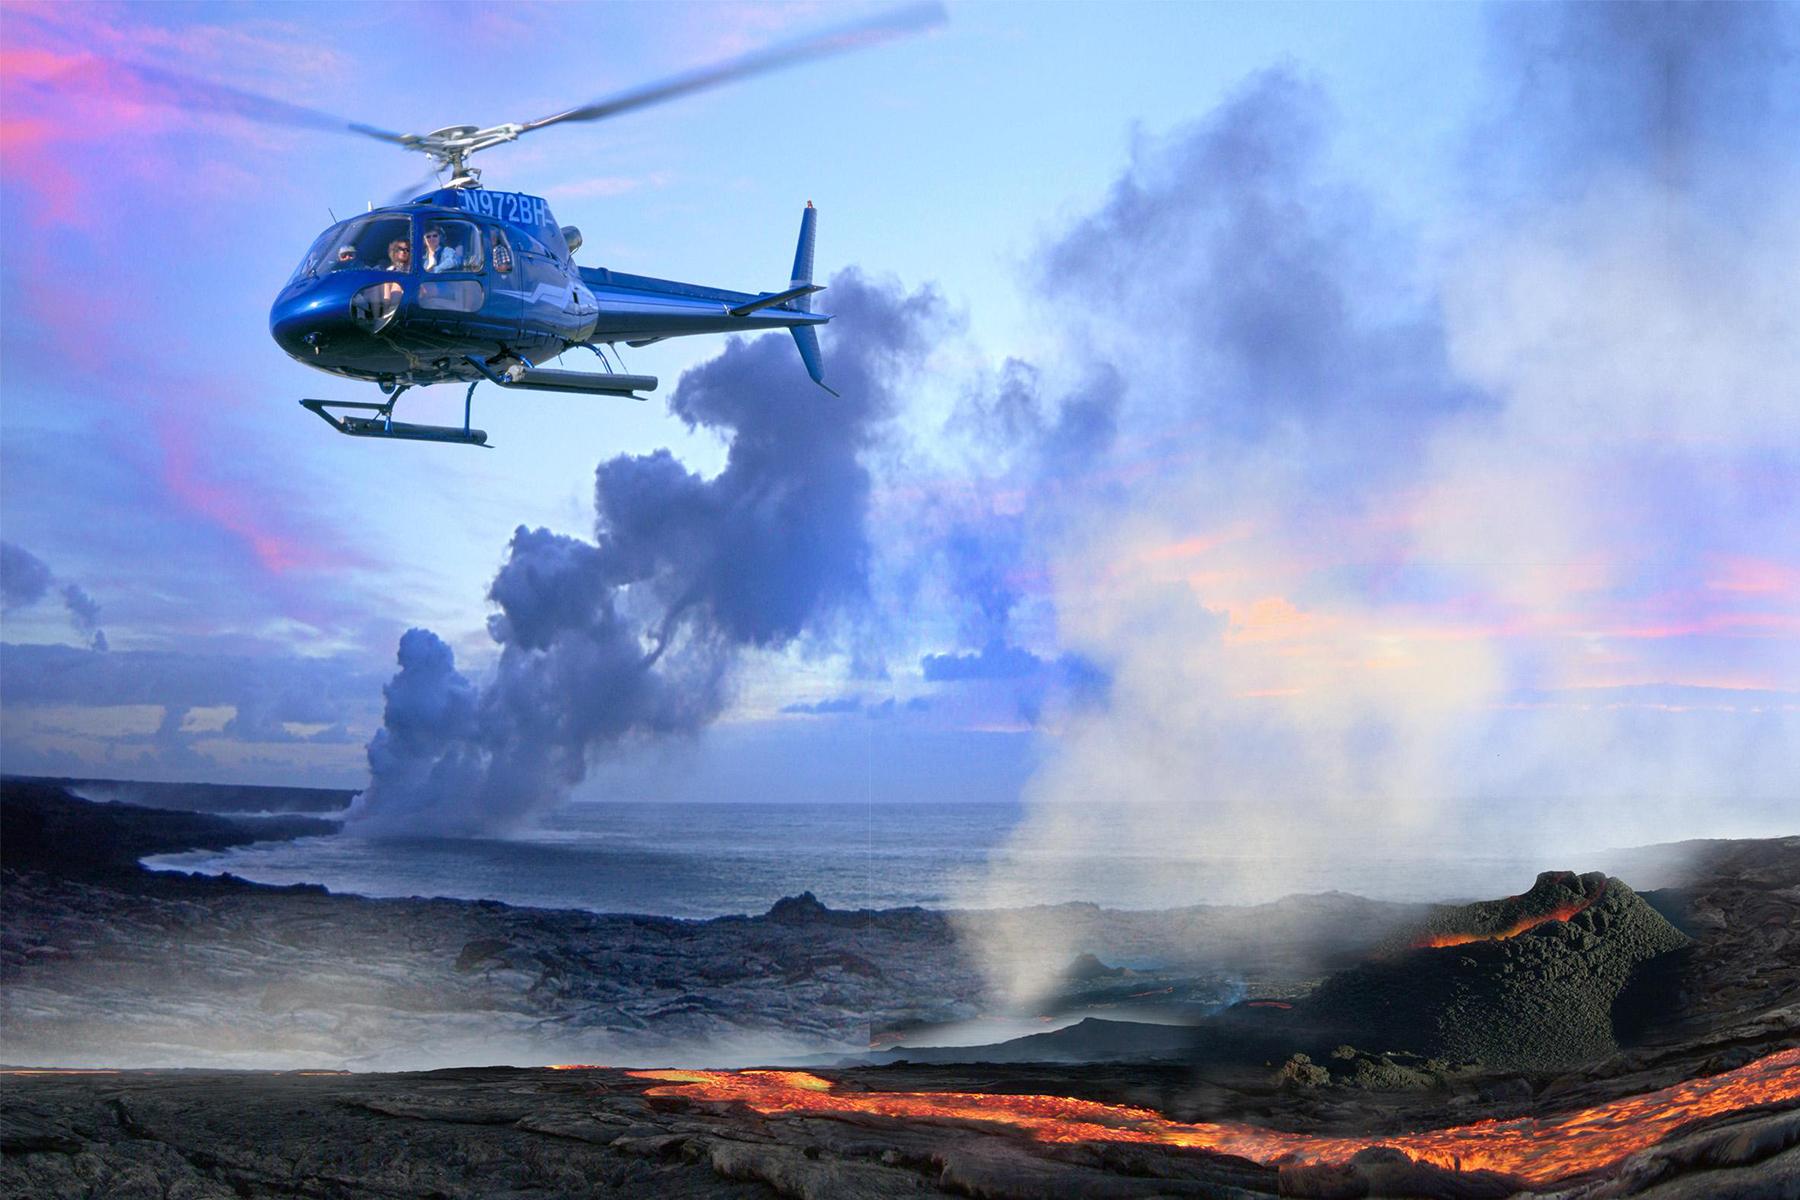 Blue Hawaiian Helicopter over volcano